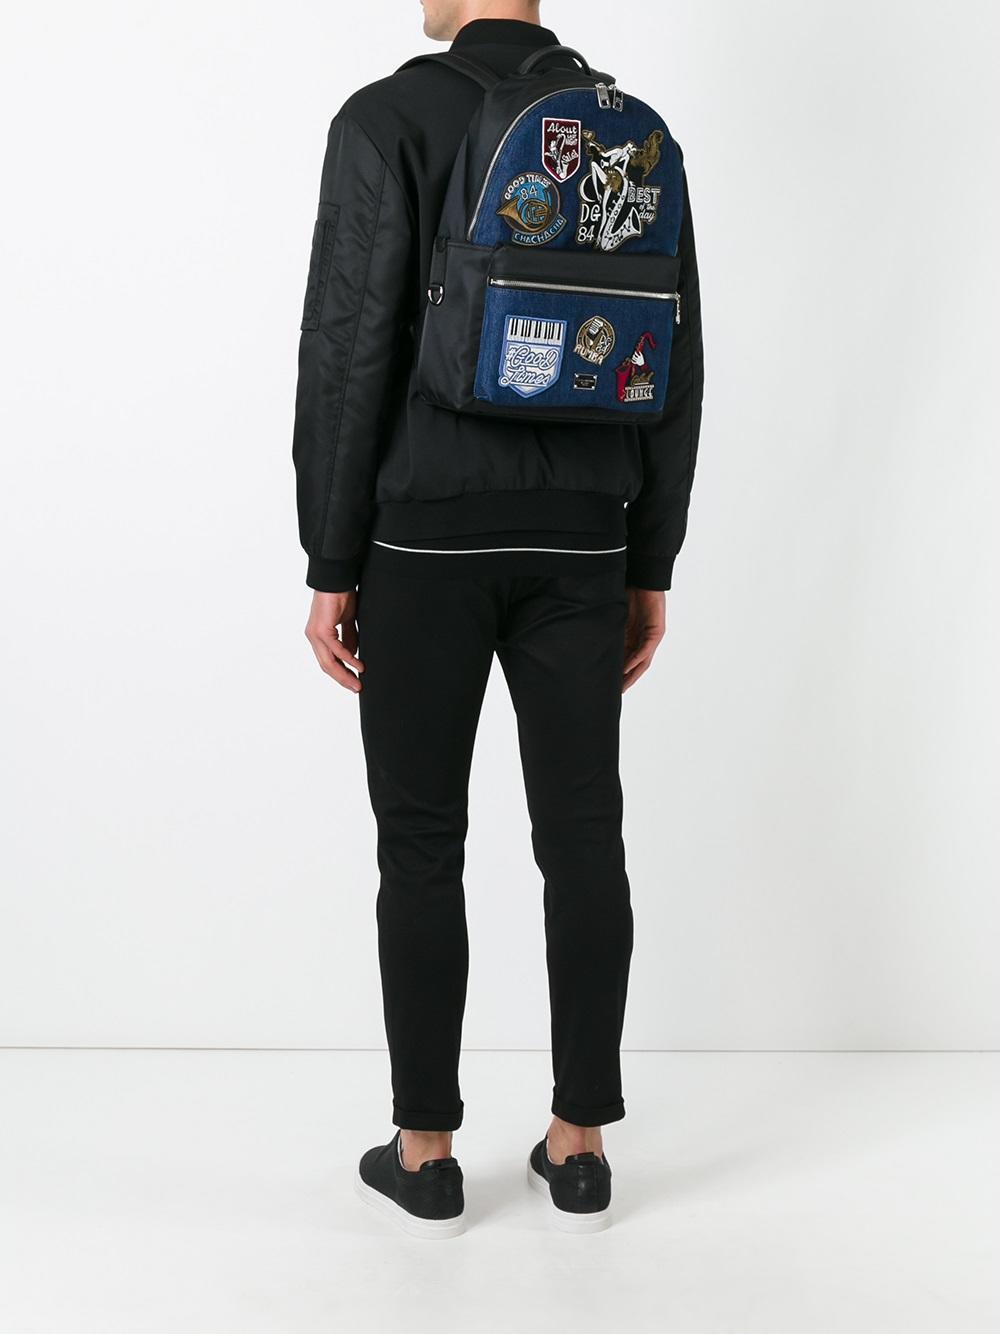 Dolce & Gabbana Denim Volcano Backpack in Blue for Men